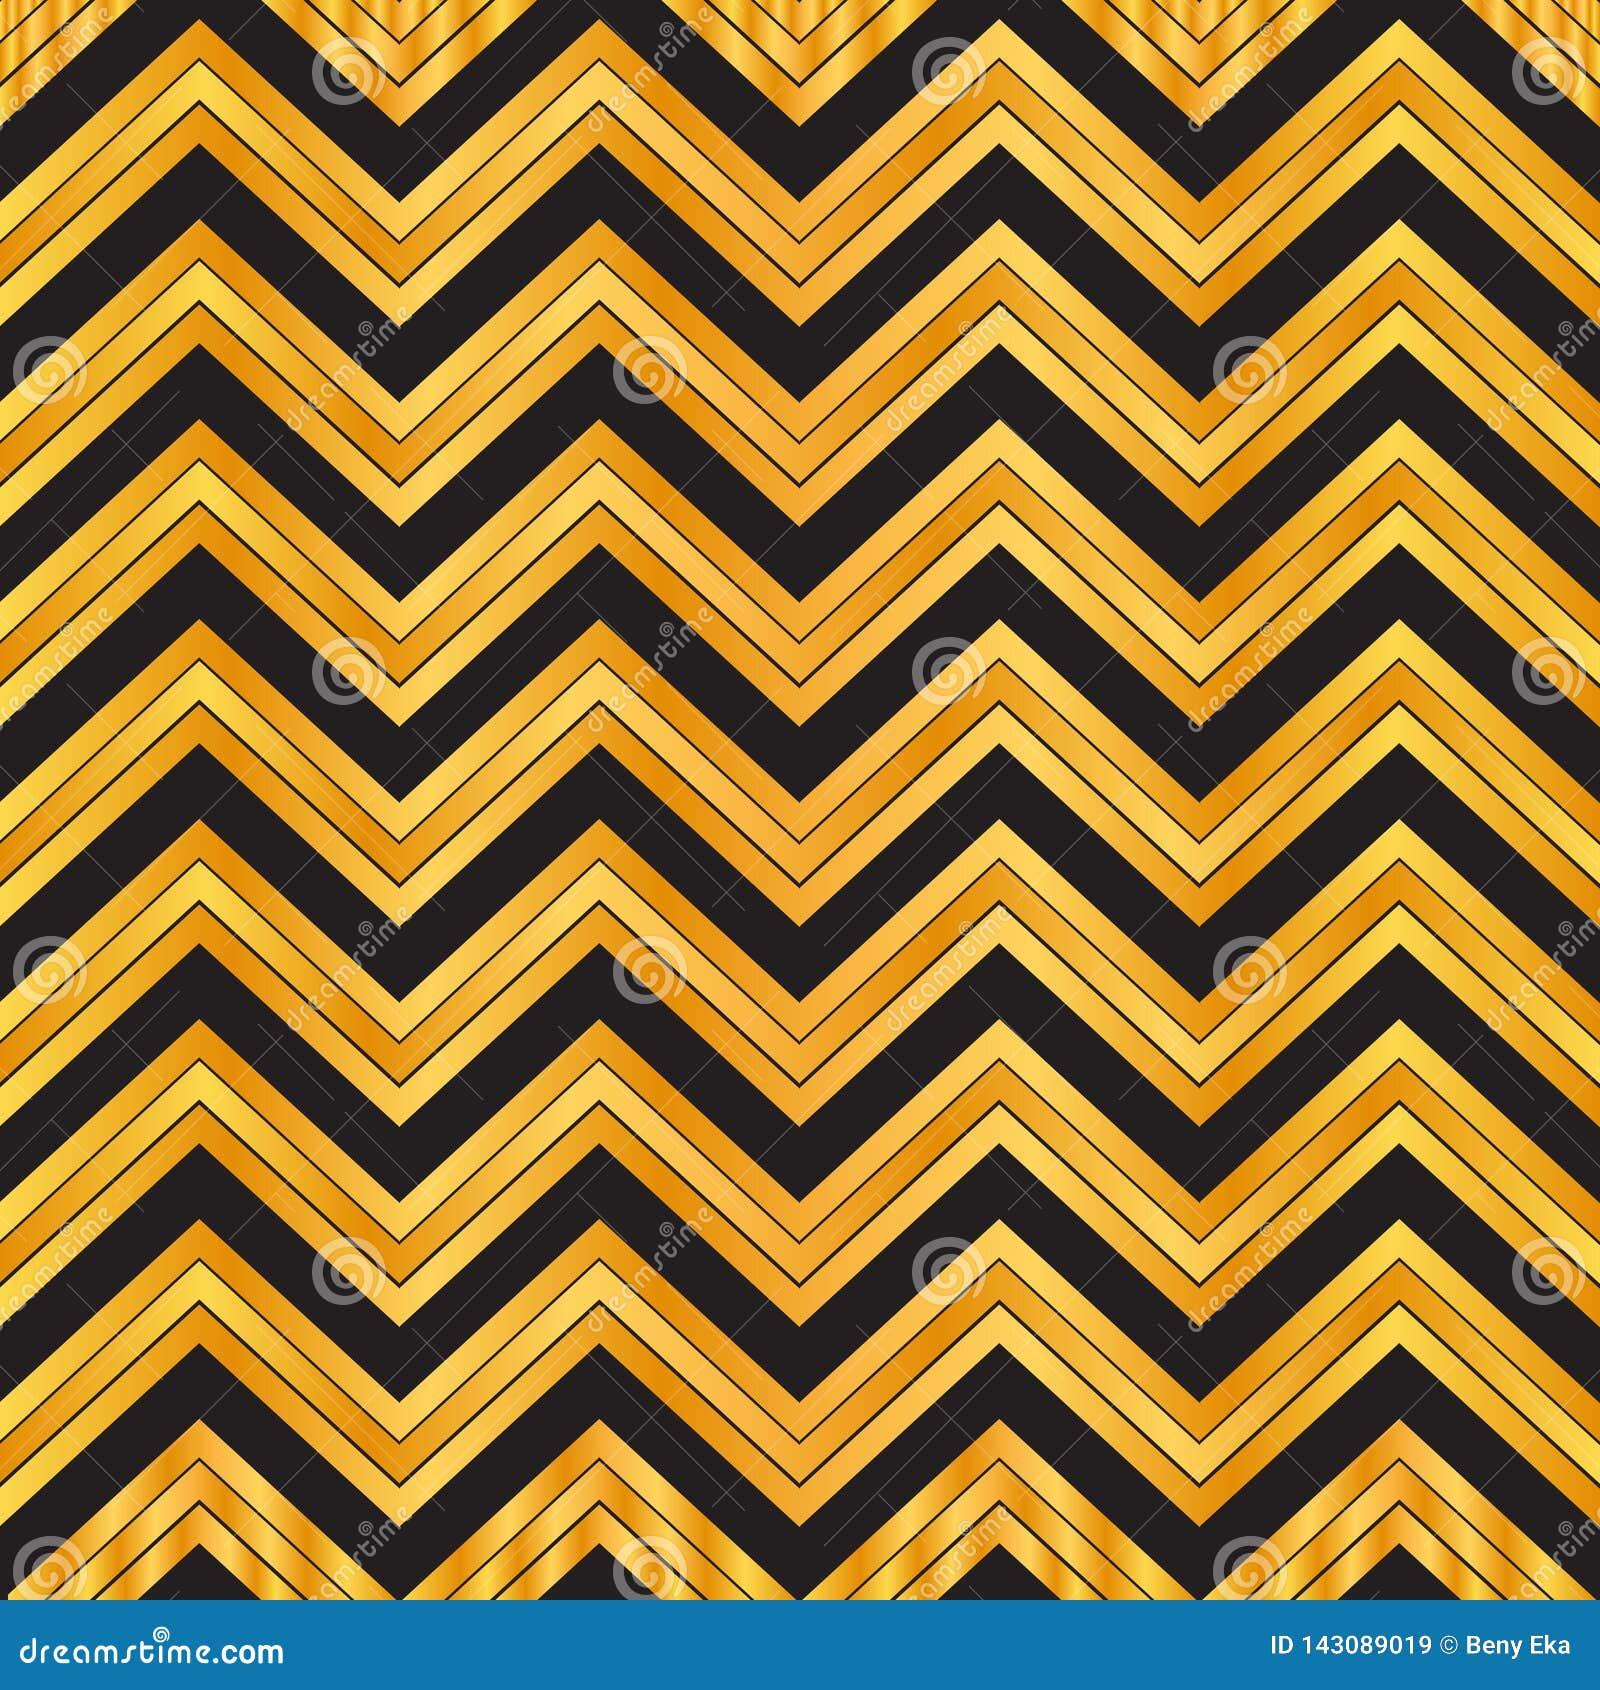 Elegant Black And Gold Geometric Seamless Zigzag Pattern